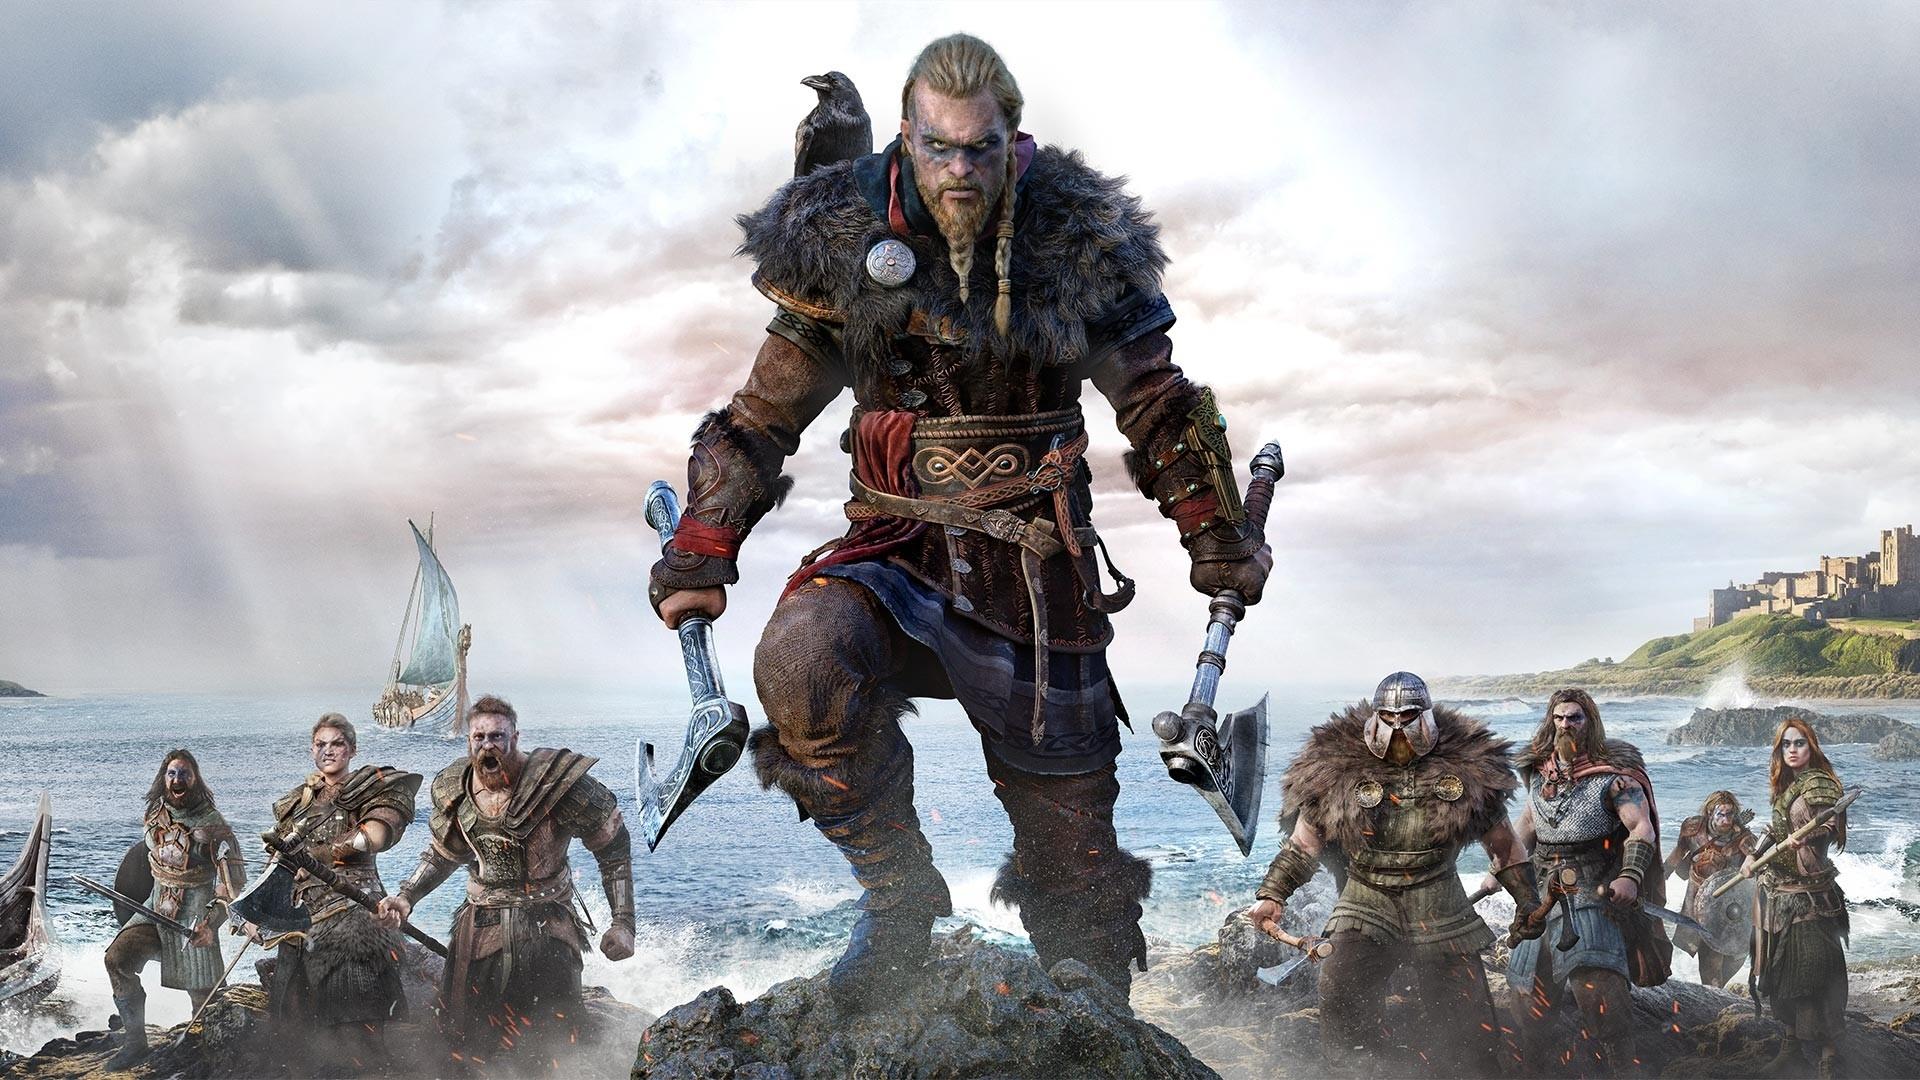 Assassins Creed Valhalla a wallpaper